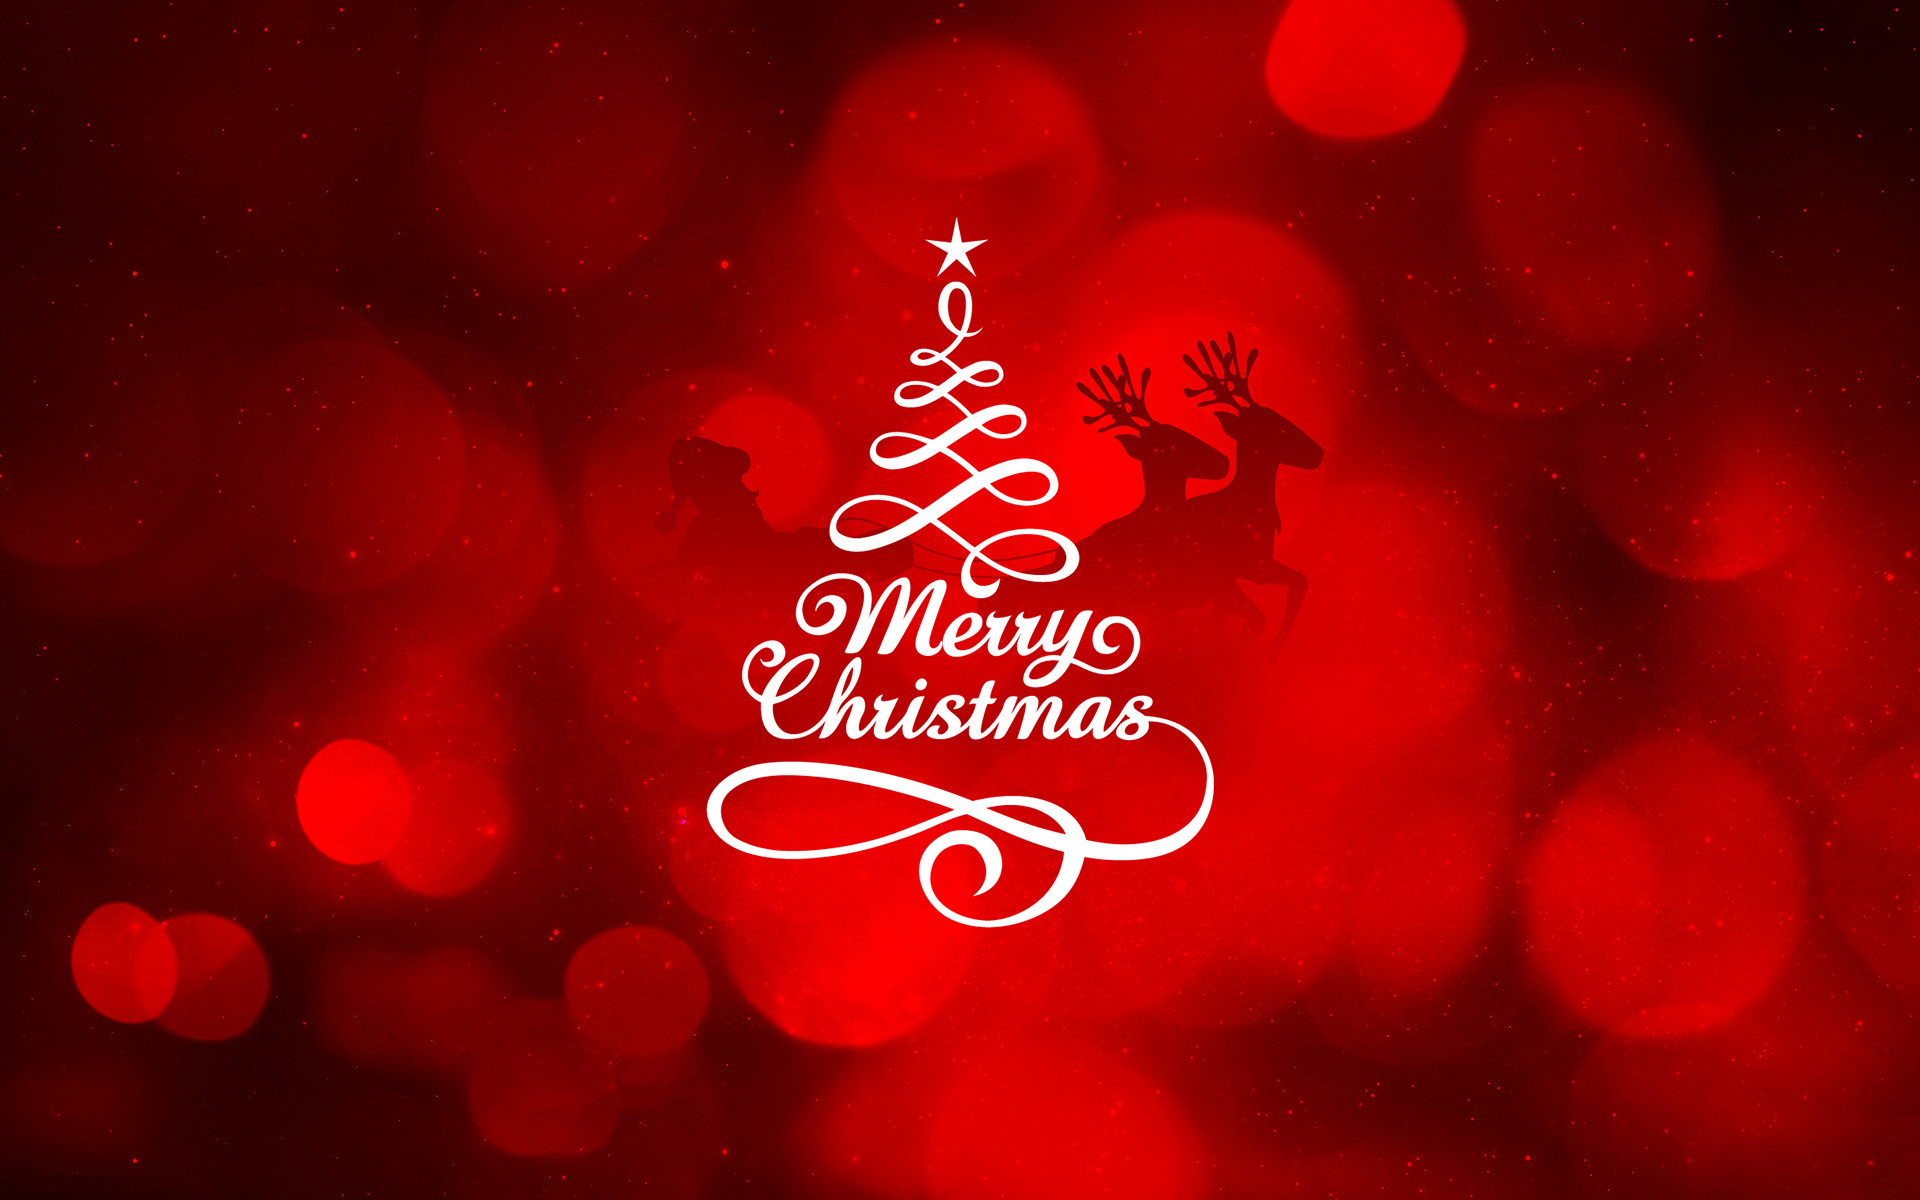 Merry Christmas New